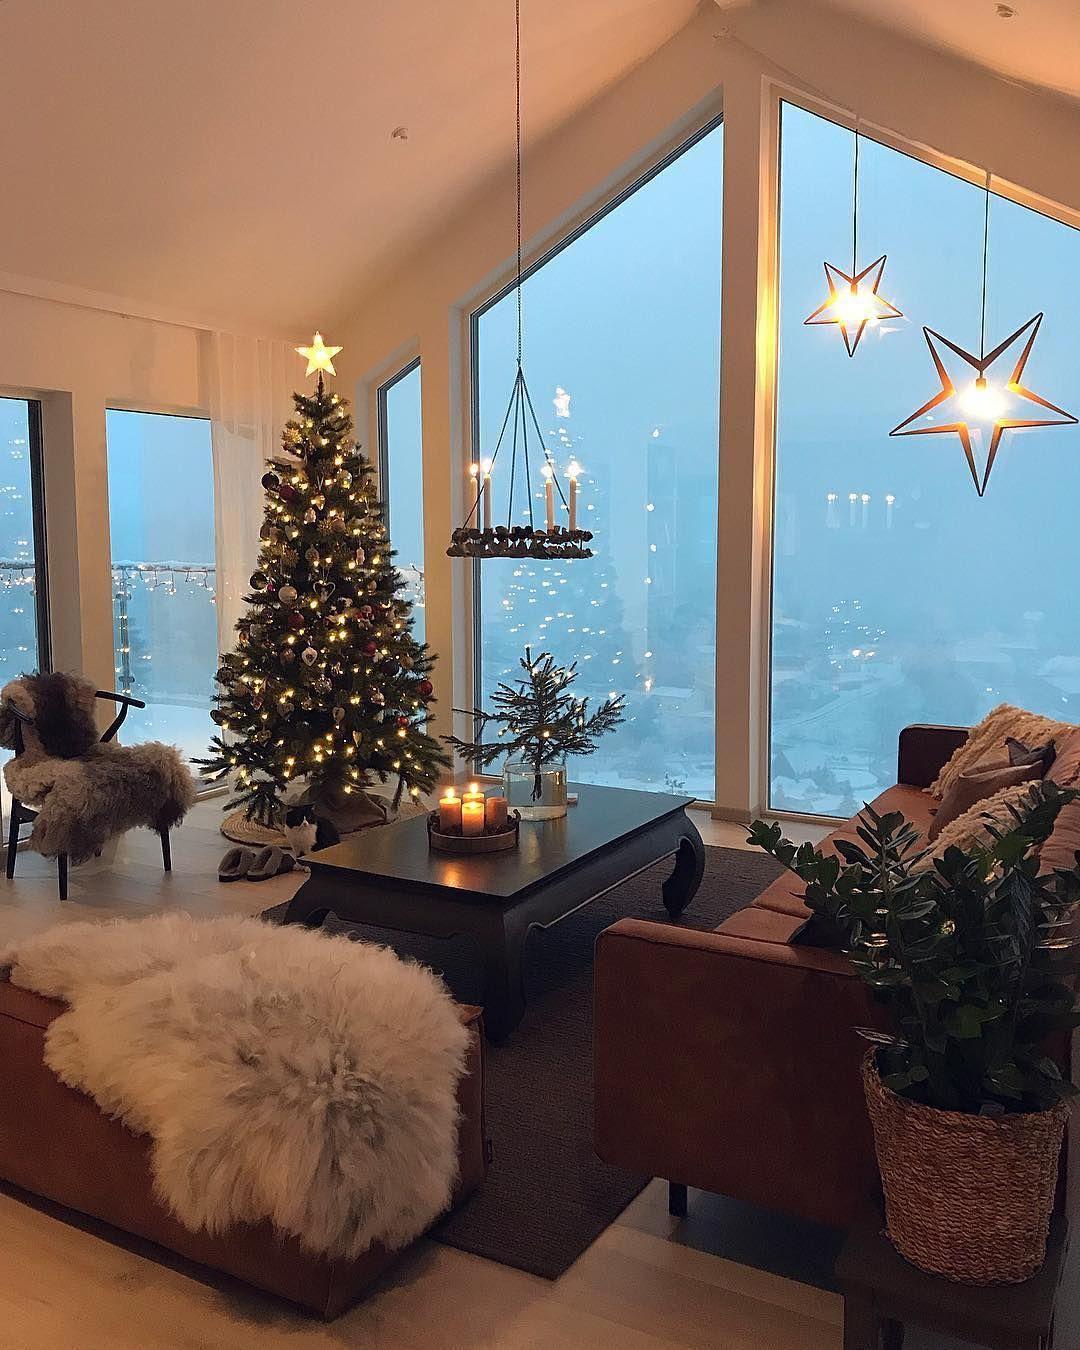 Zimmer mit Aussicht  .  @husefjell .   Unser Adventskalender auf Facebook: tägl #julepyntinspiration